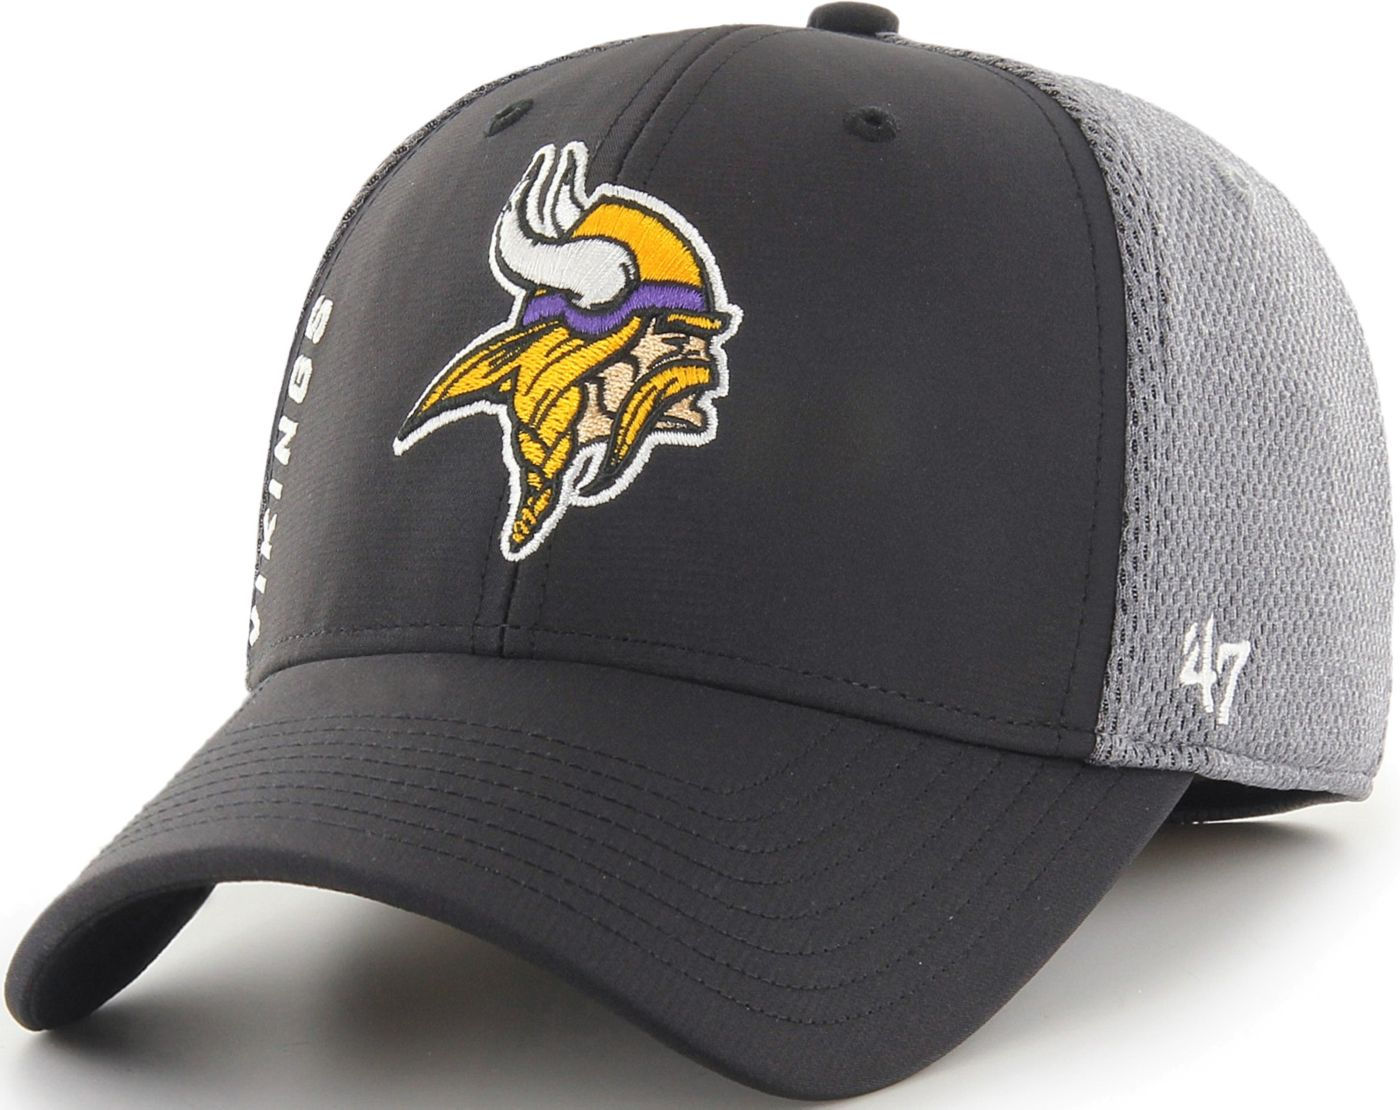 '47 Men's Minnesota Vikings Wycliff Contender Stretch Fit Black Hat